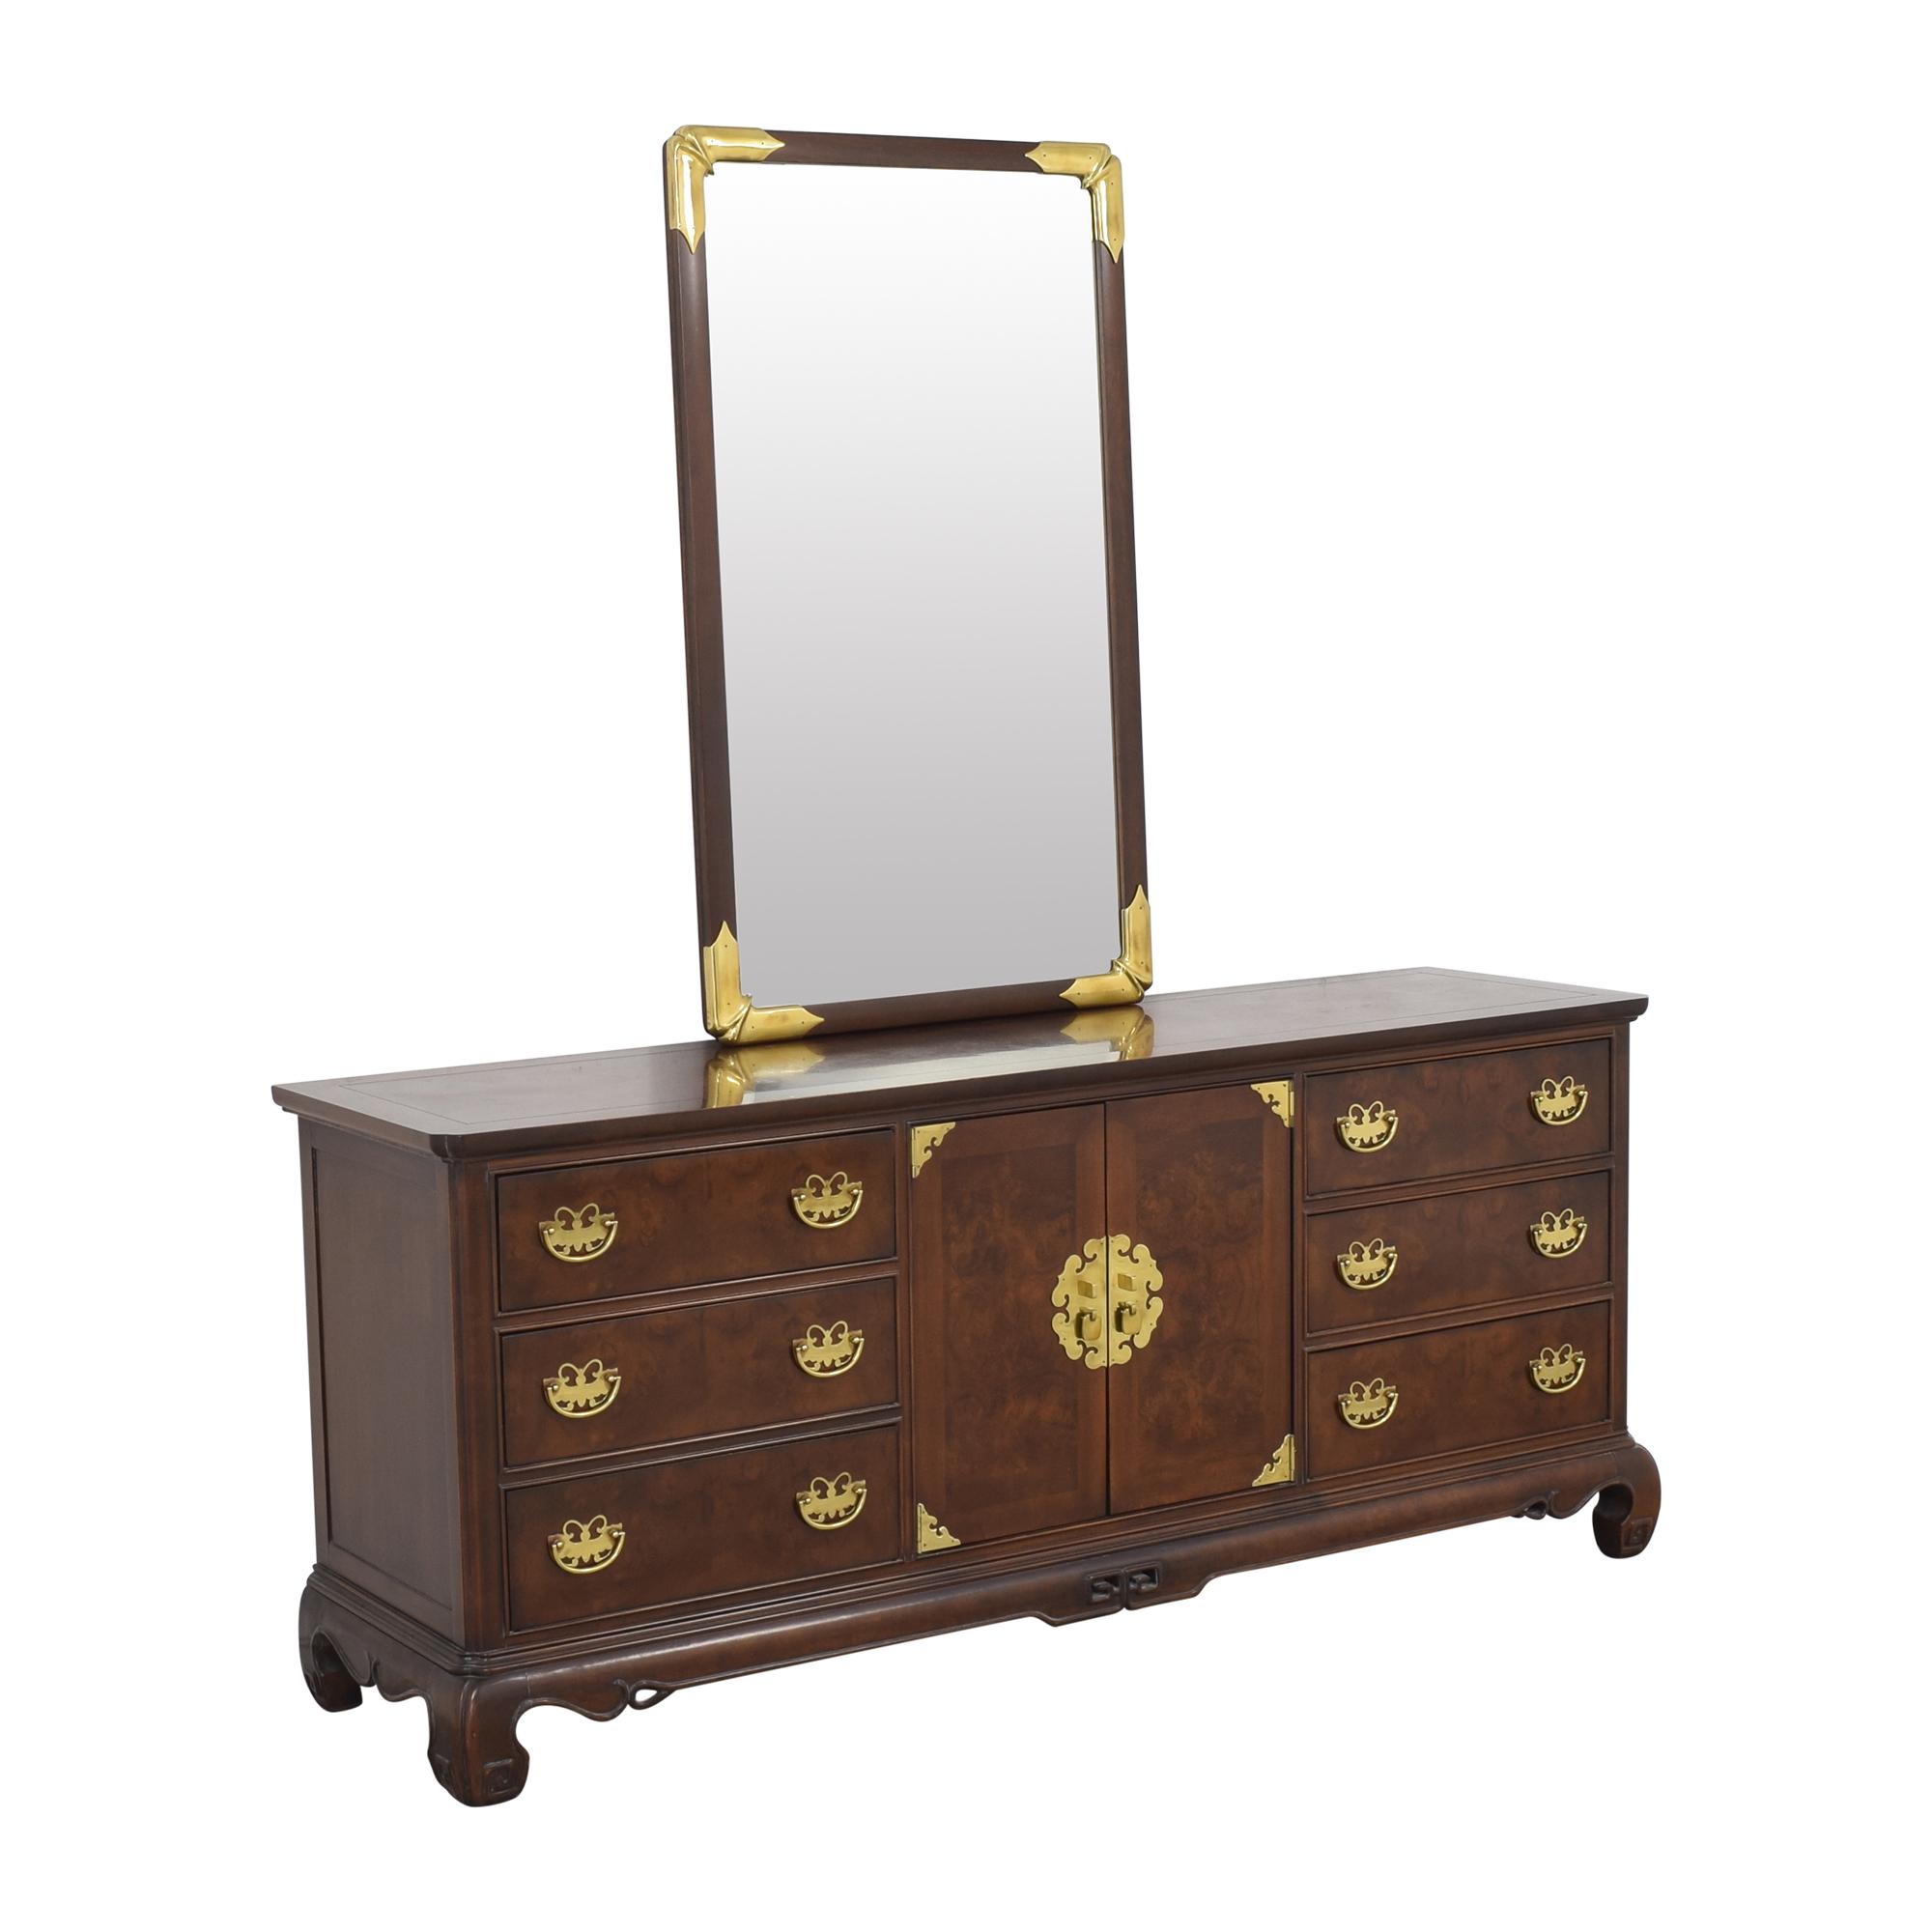 Heritage Henredon Heritage Henredon Dresser with Mirror coupon